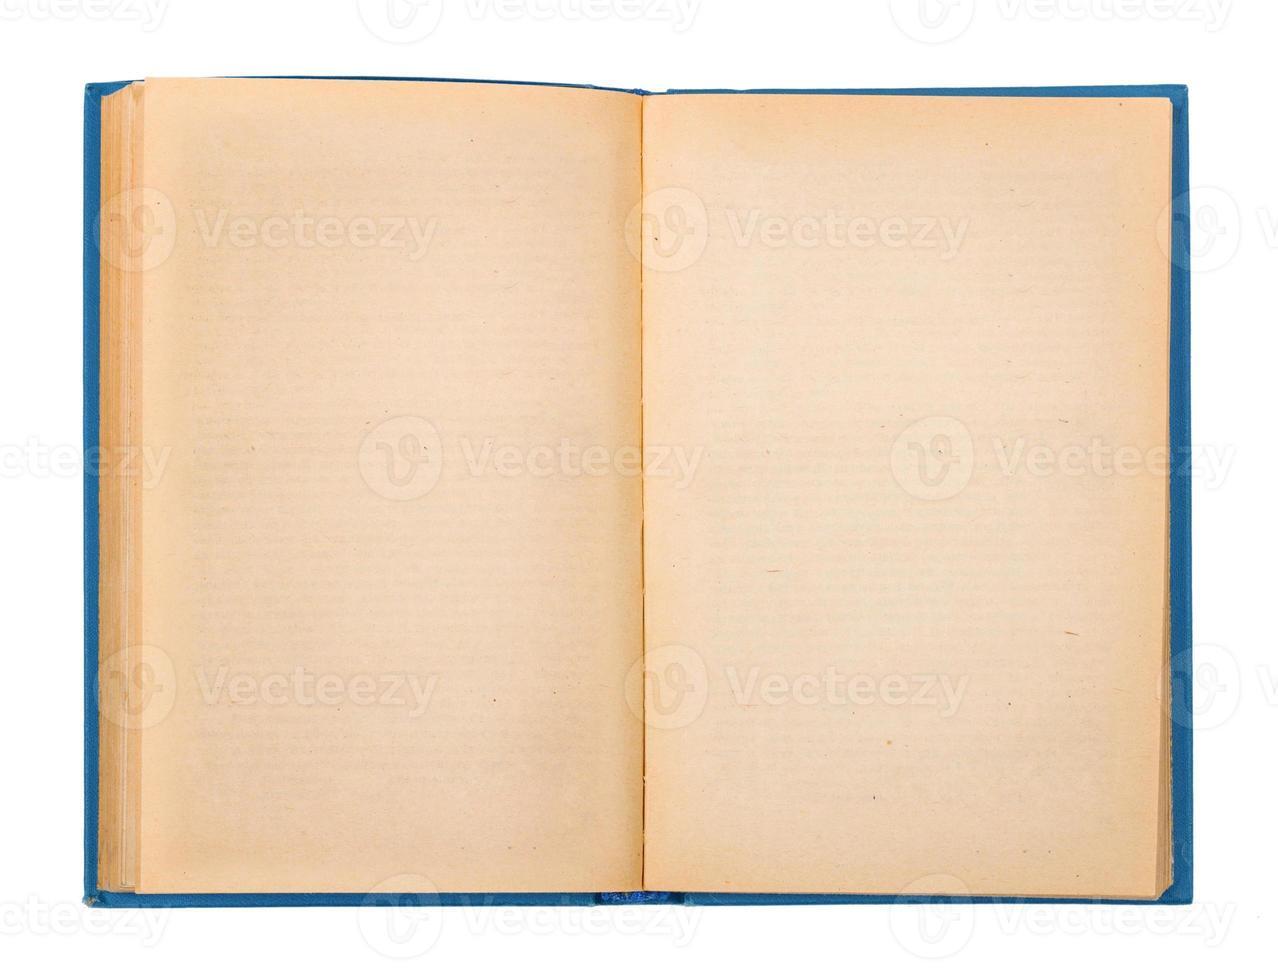 copertina del libro aperto vuota isolata on white foto